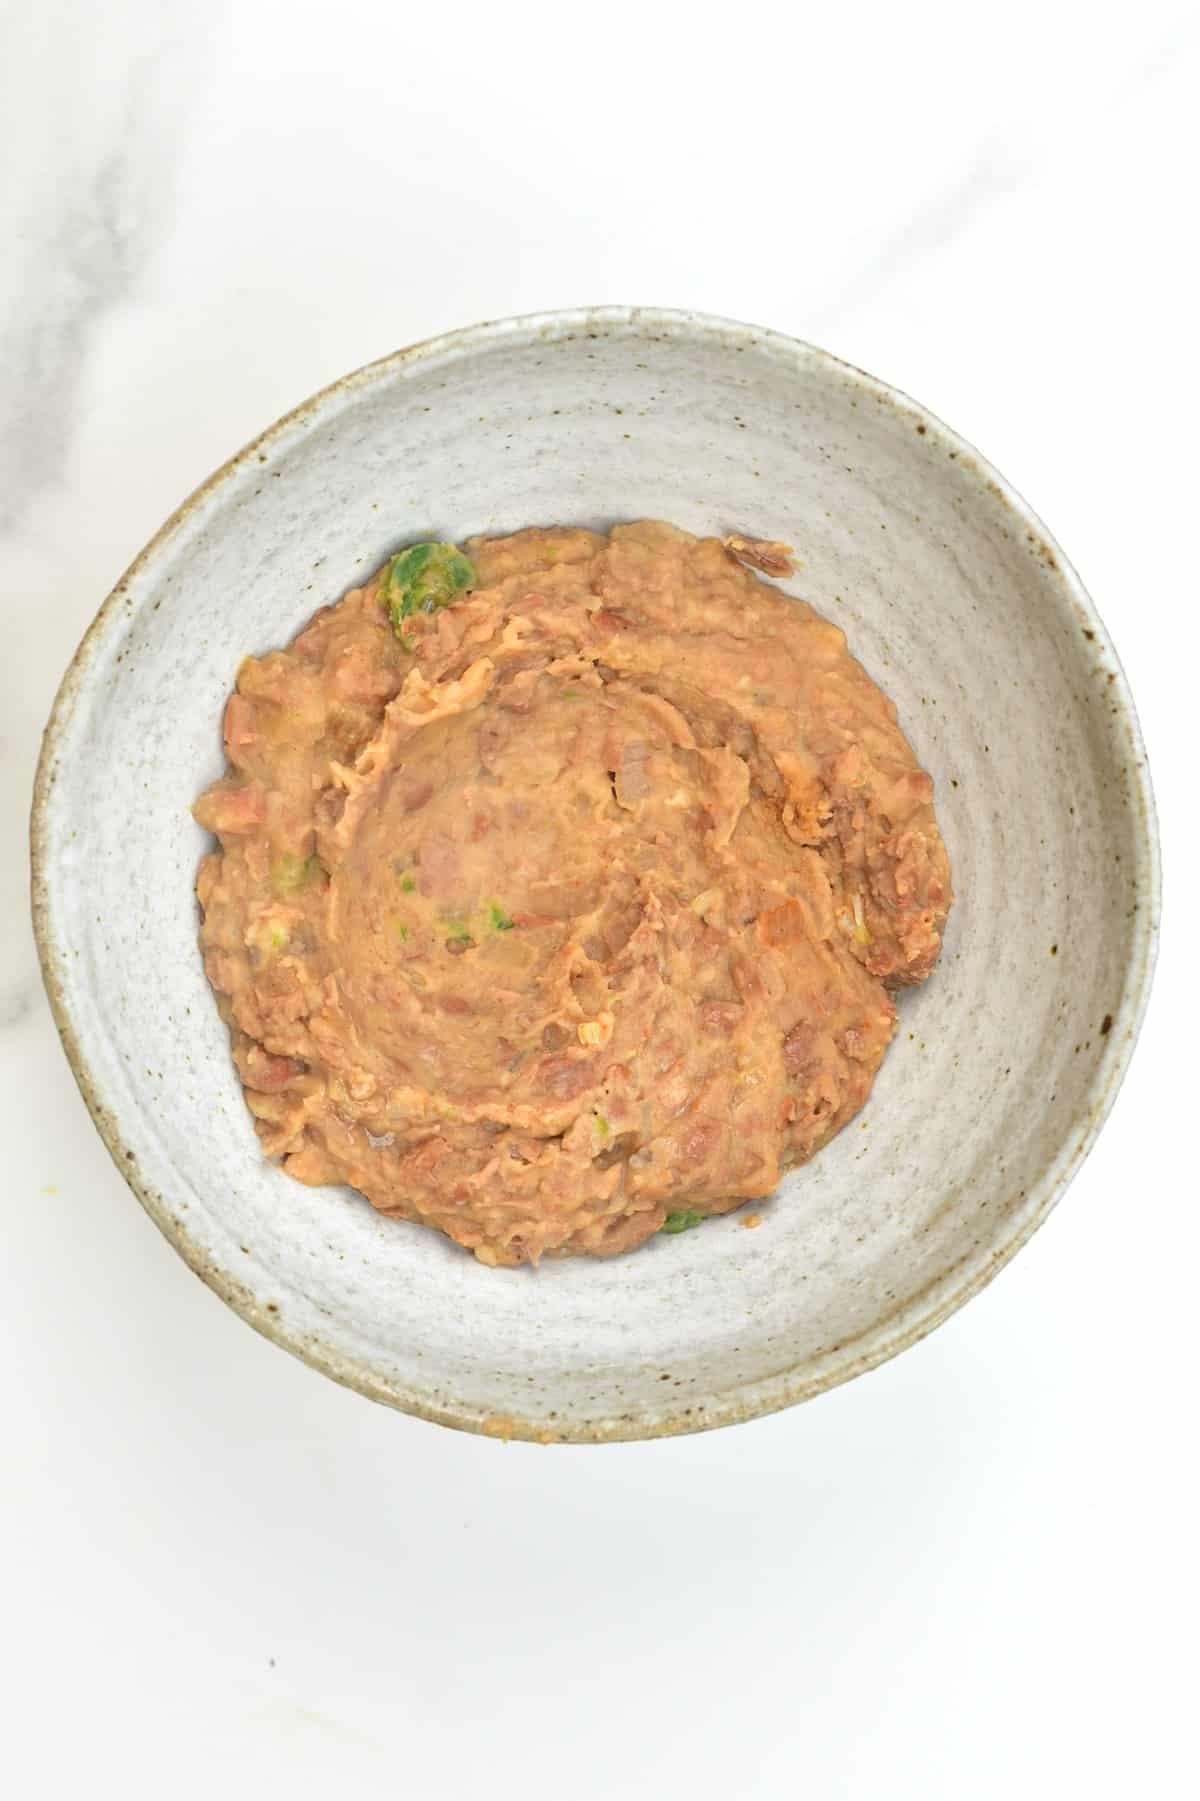 Vegan refried beans in a bowl (frijoles refritos)